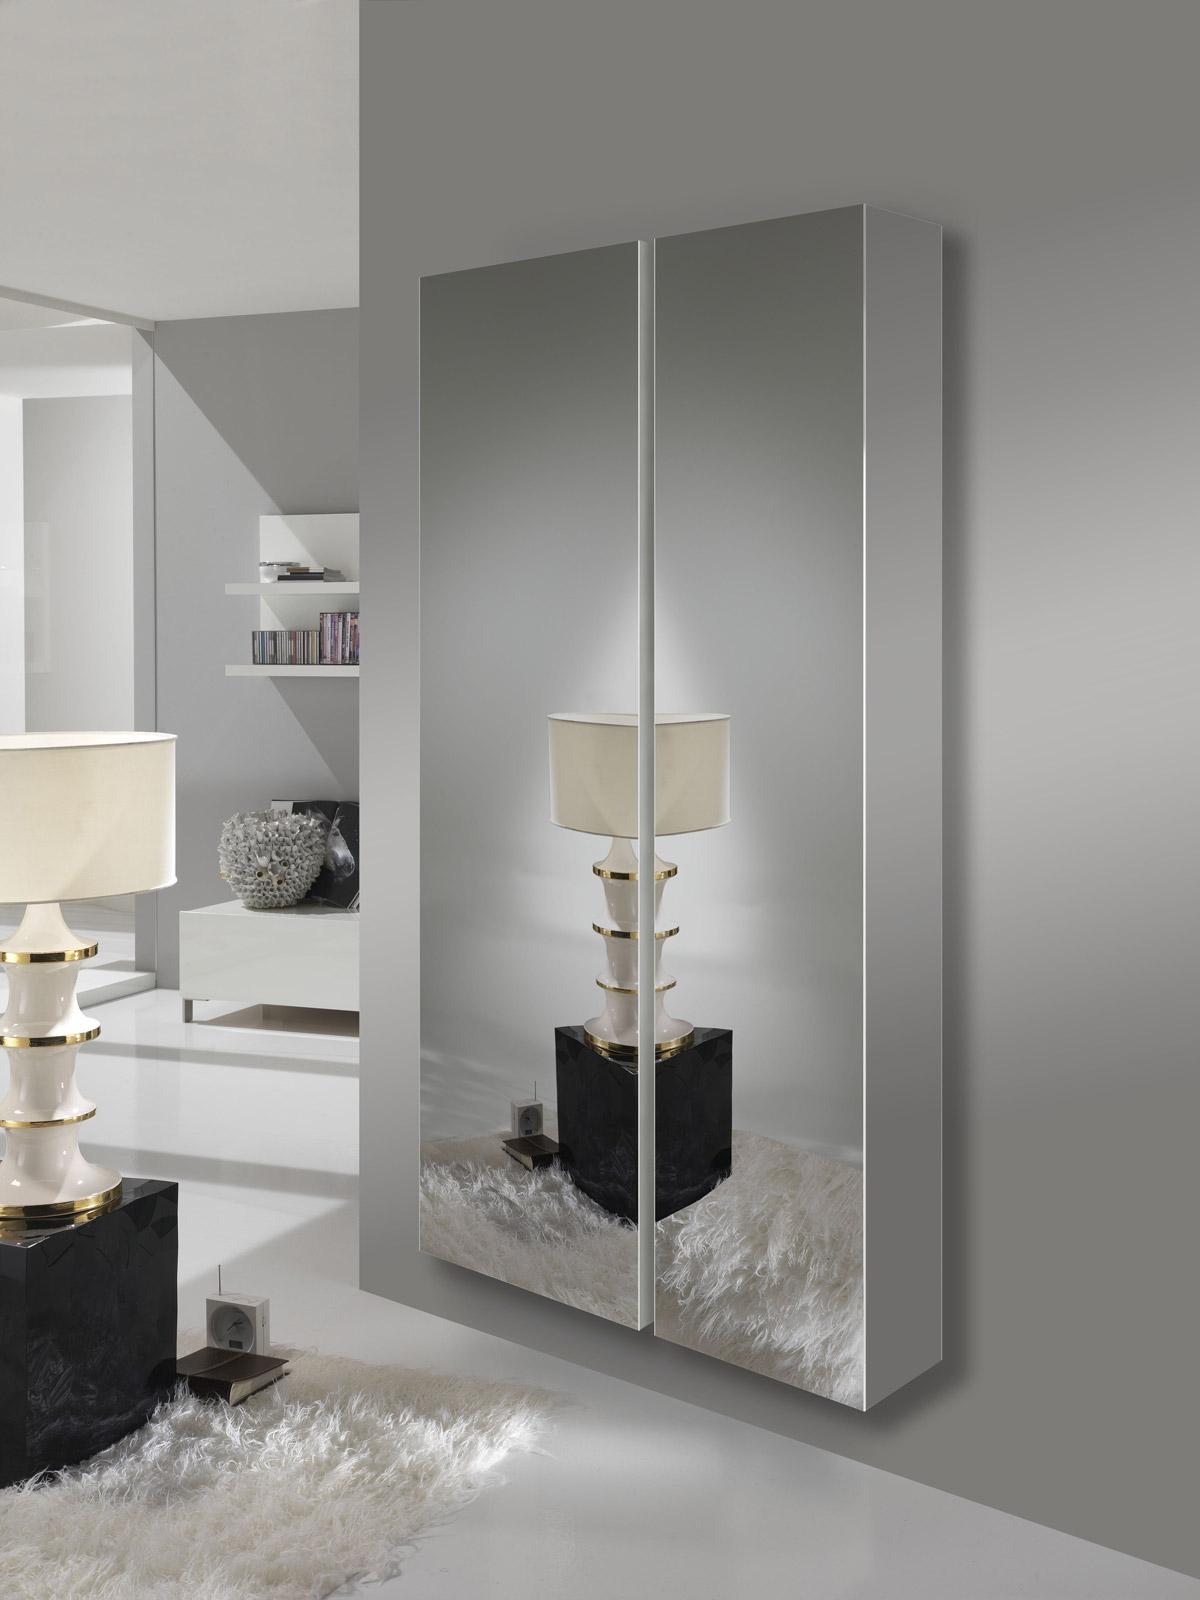 Mirror esalinea fratantoni arredamenti rieti - Scarpiera specchio ikea ...